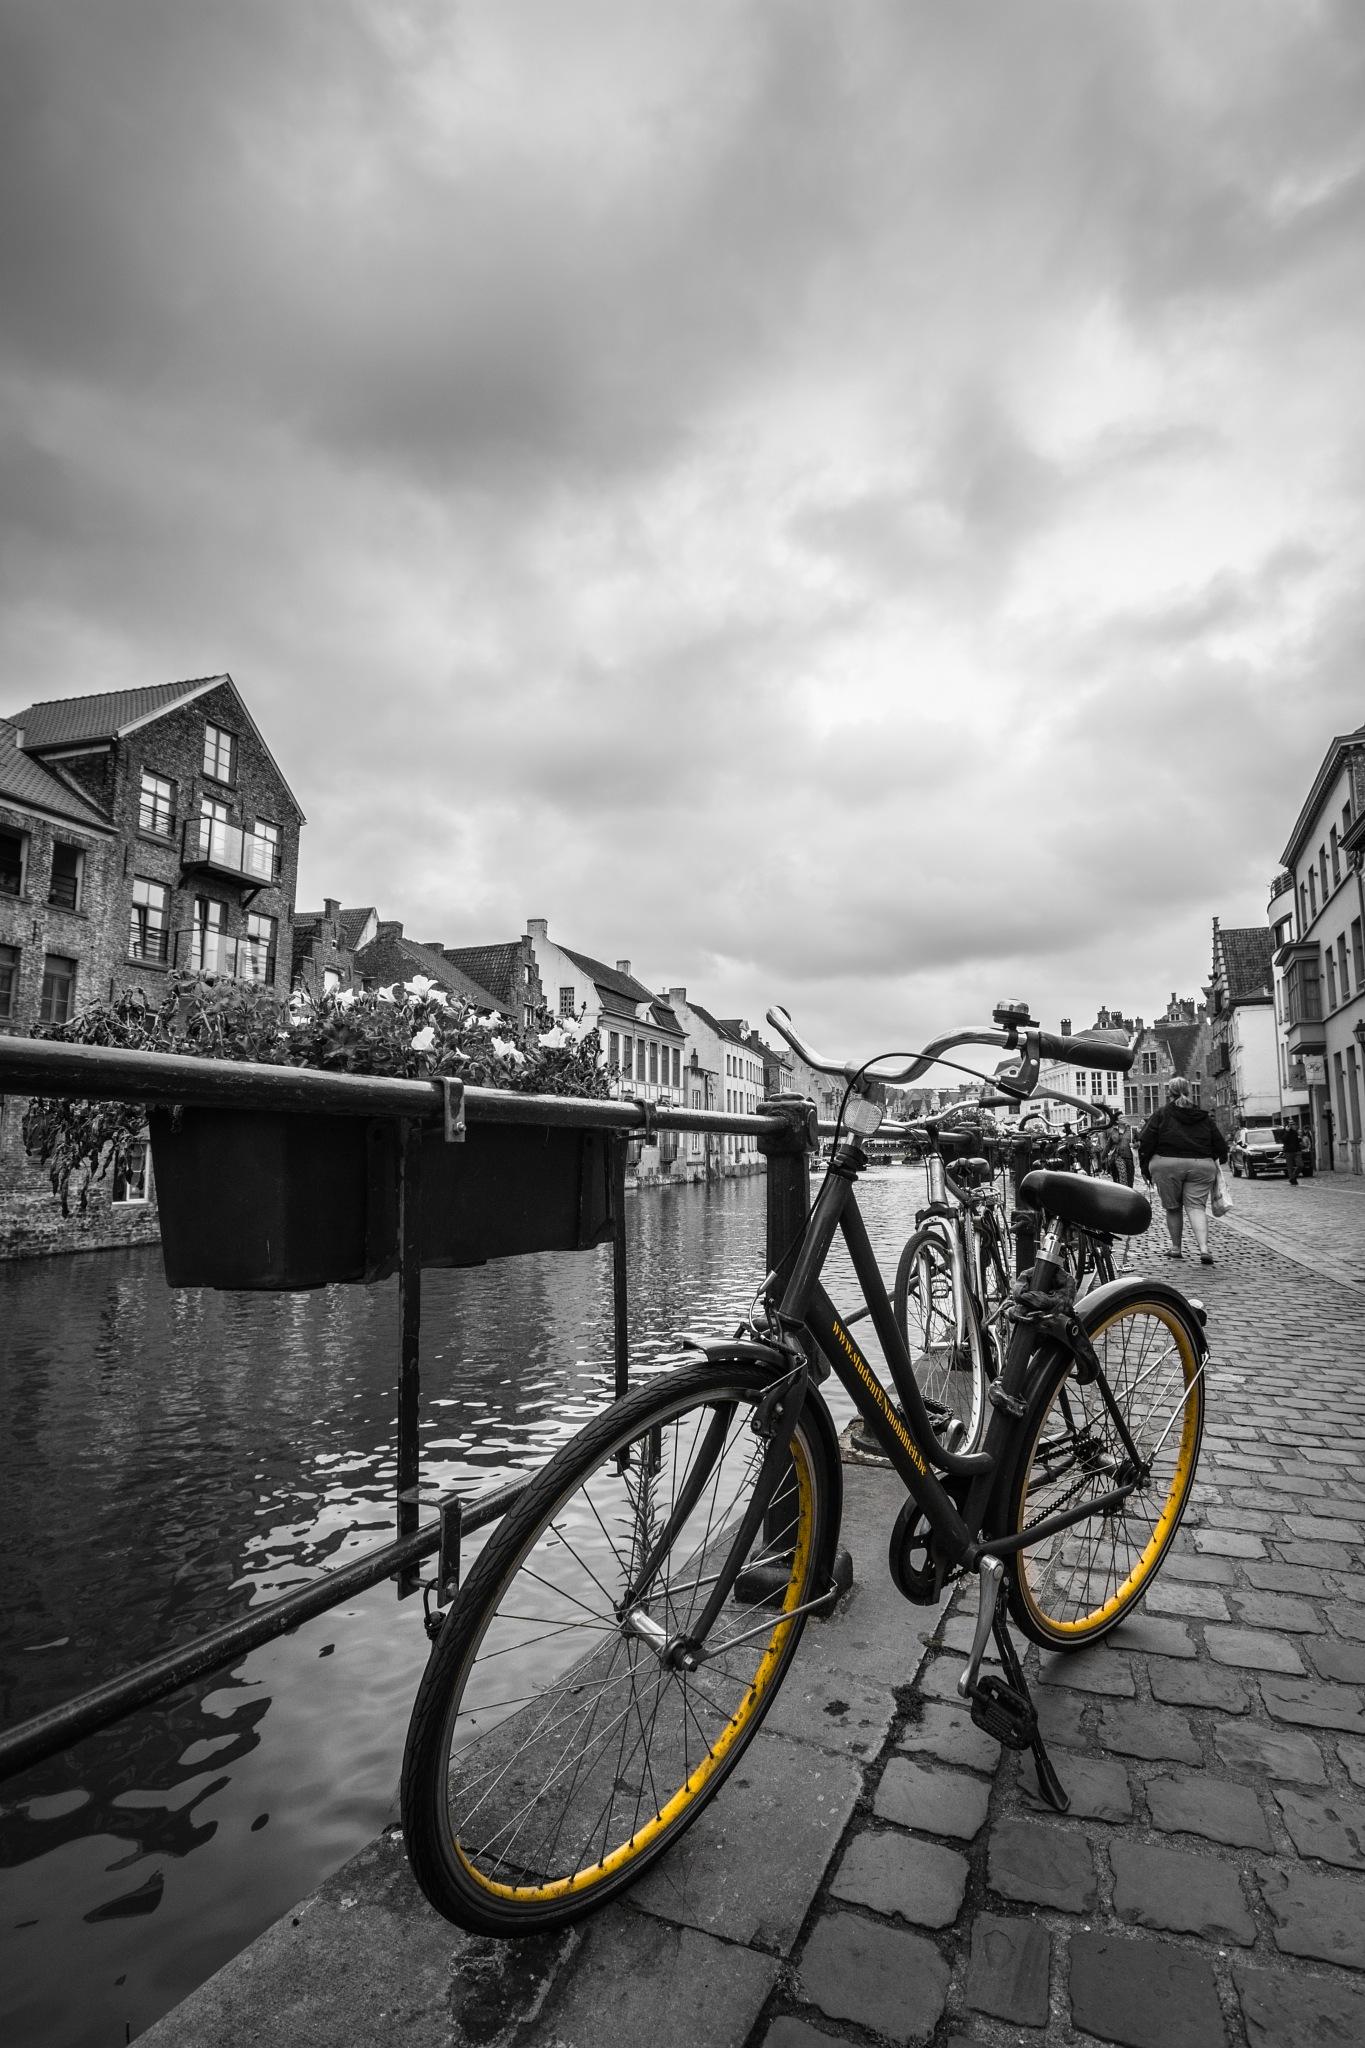 Bike and Gold by Julien Hudym